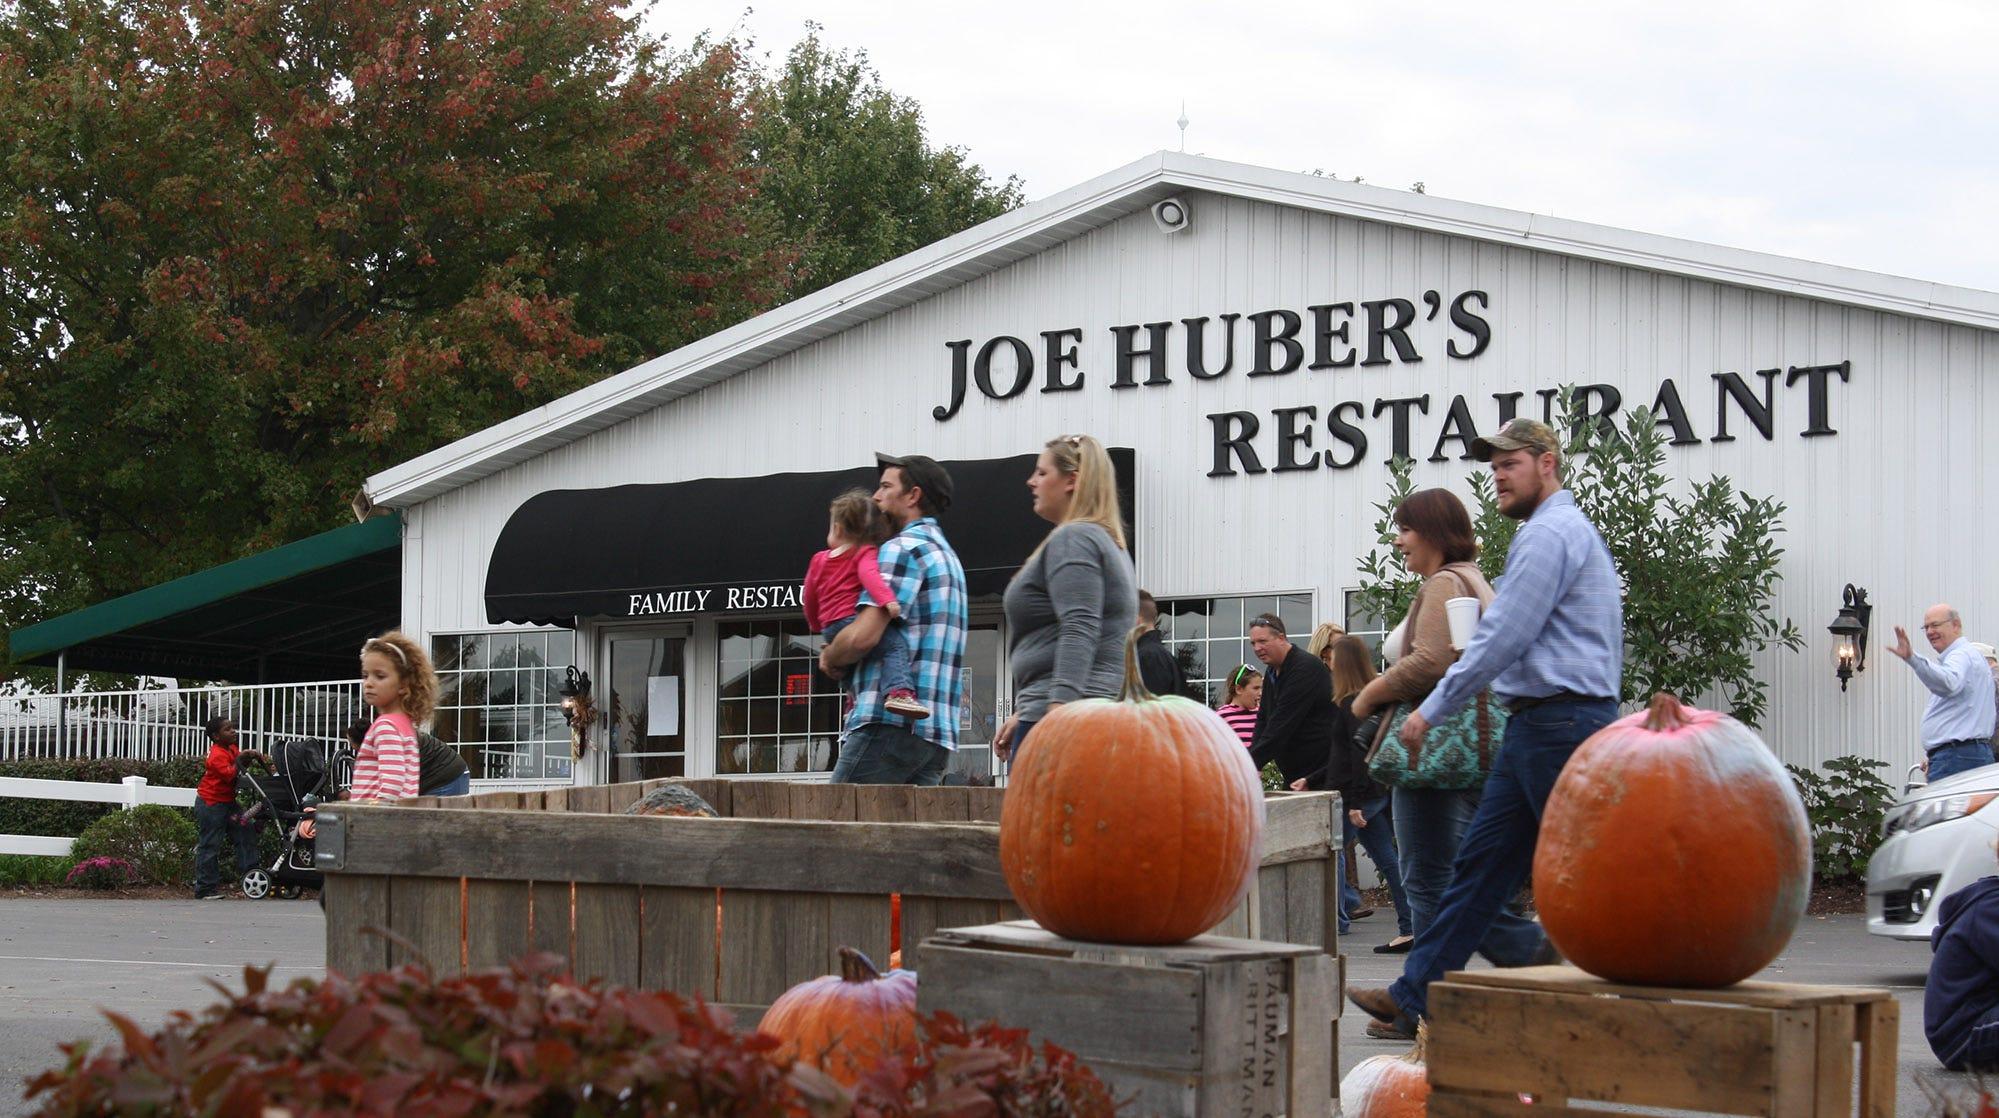 Joe Huber's Family Farm & Restaurant, a local landmark, to be sold